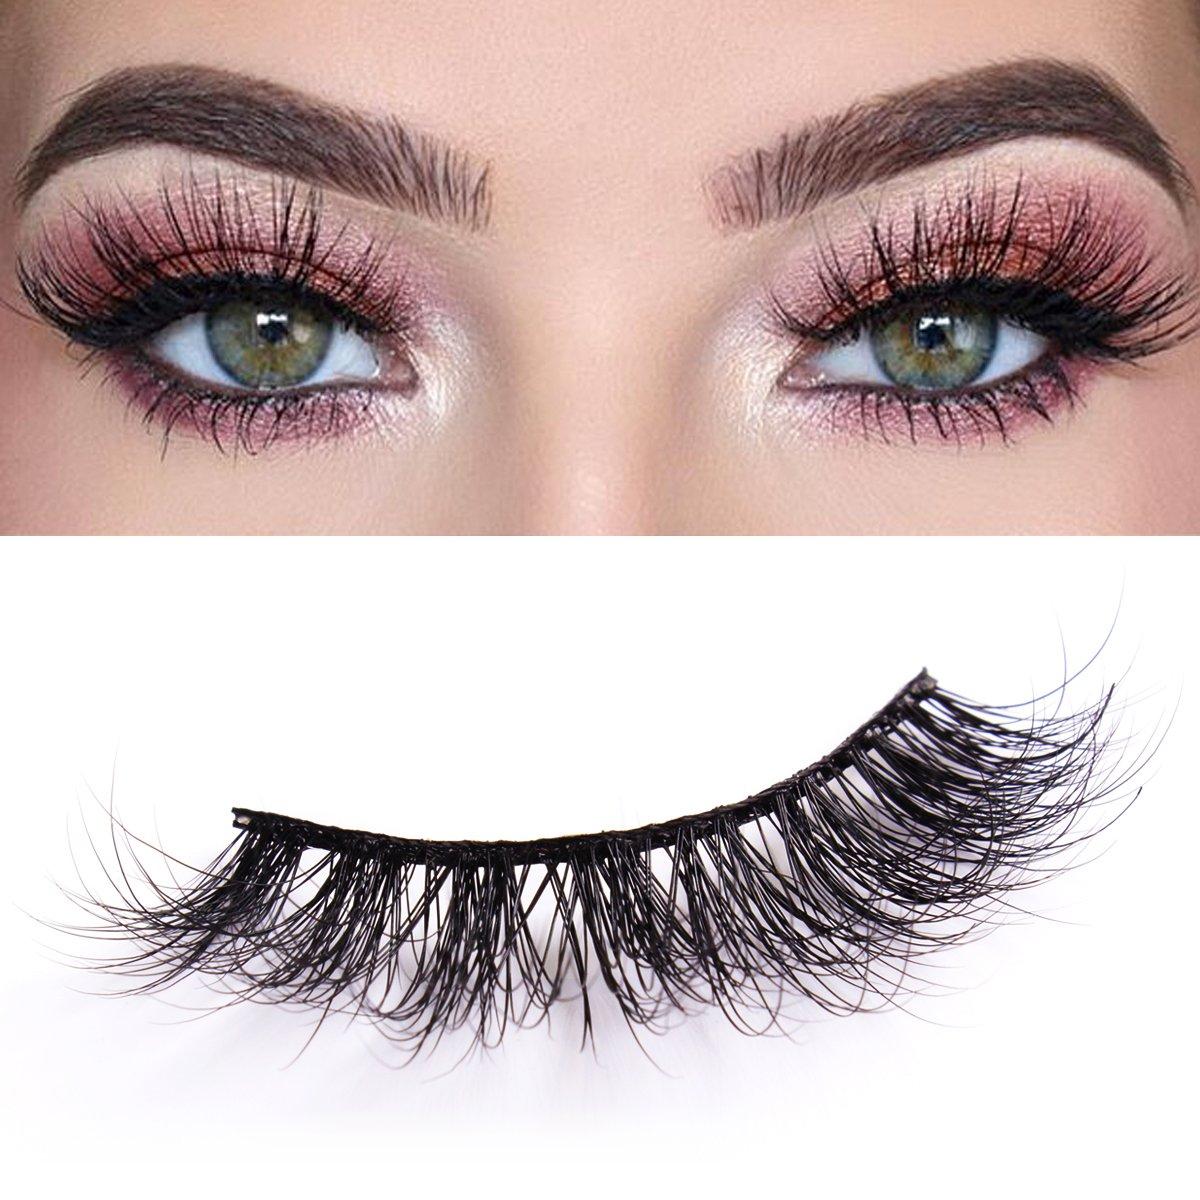 501b41eddf7 Amazon.com : 3D Mink Eyelashes Makeup Dramatic False Eyelashes Natural Look  Fluffy Long Reusable Falsies Eyelashes 1 Pair Pack Kelmall : Beauty